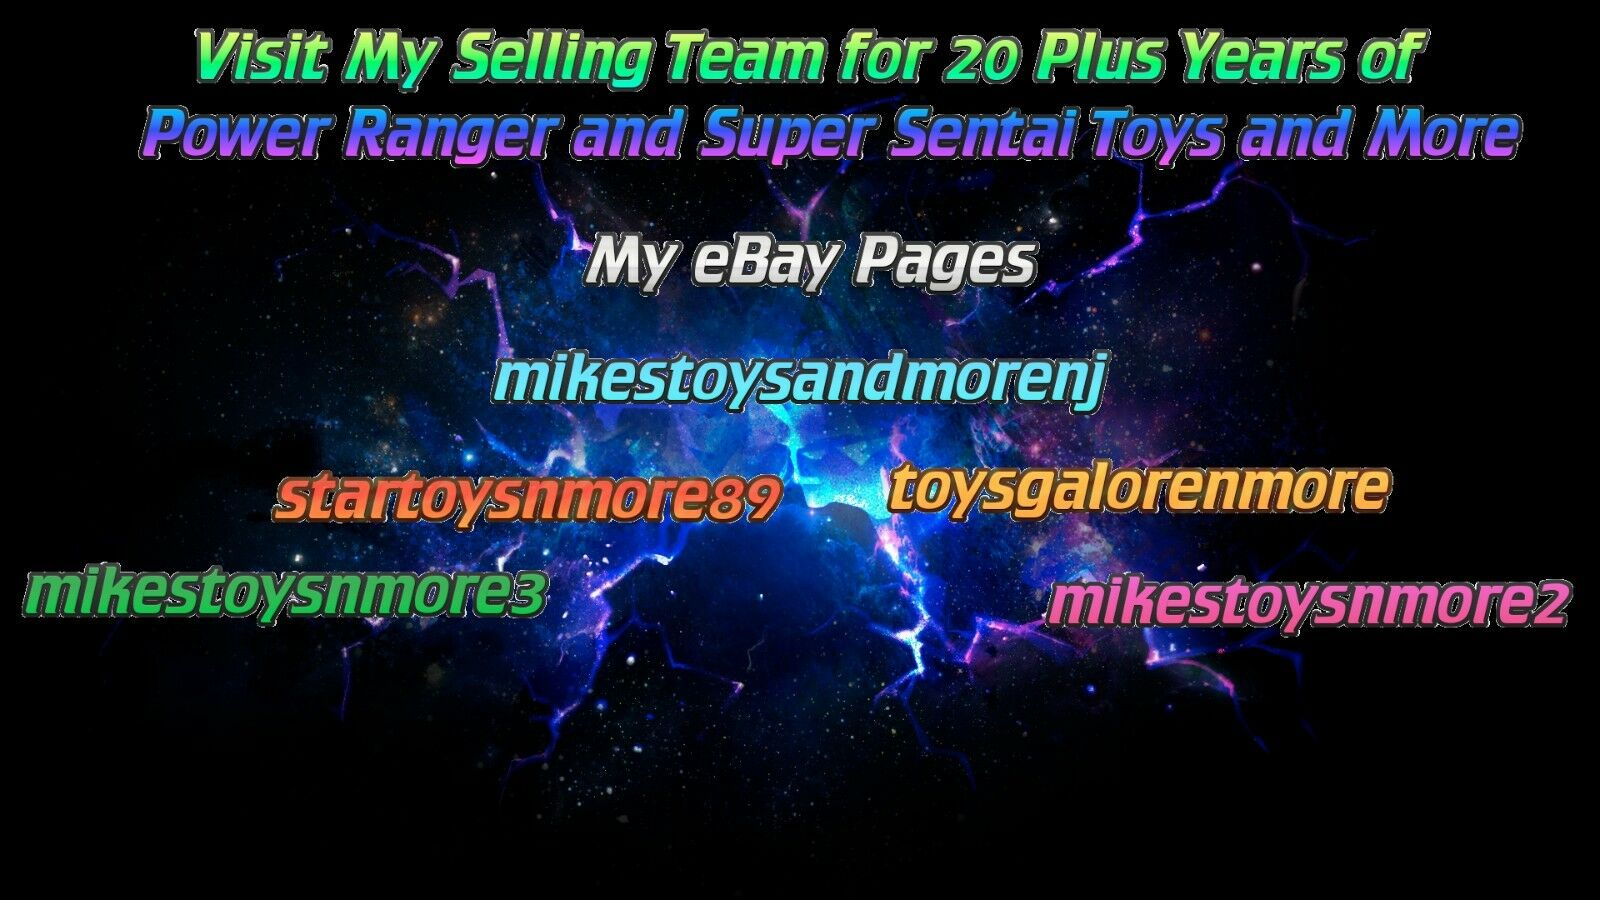 Power Rangers Rangers Rangers Ninja Storm Red Electric Sounds Plush New 2003 Doll ToysRus f33c4e